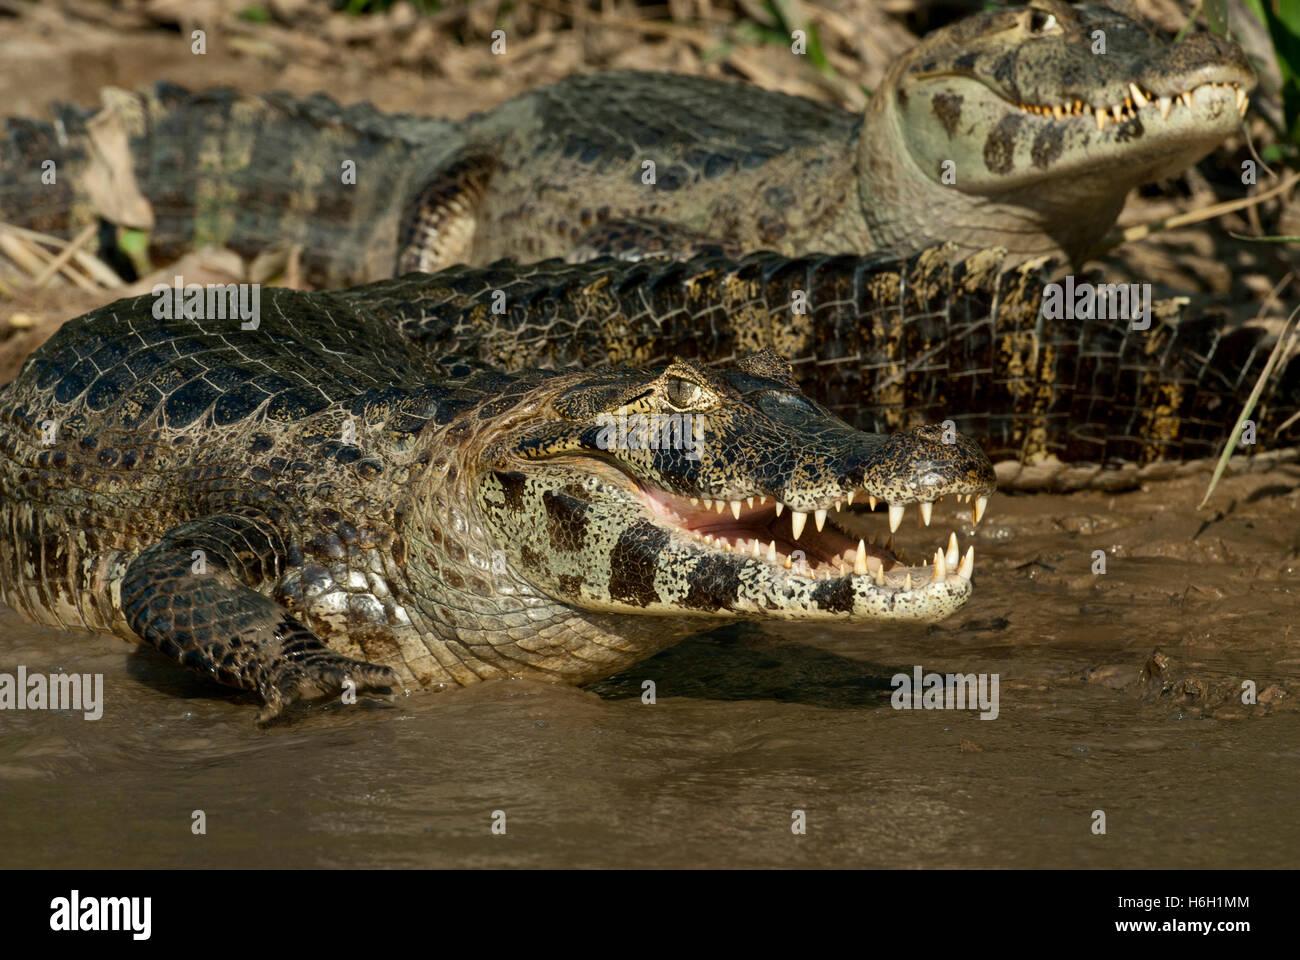 Yacare caiman (Caiman yacare) in a river in the Pantanal, Brazil - Stock Image